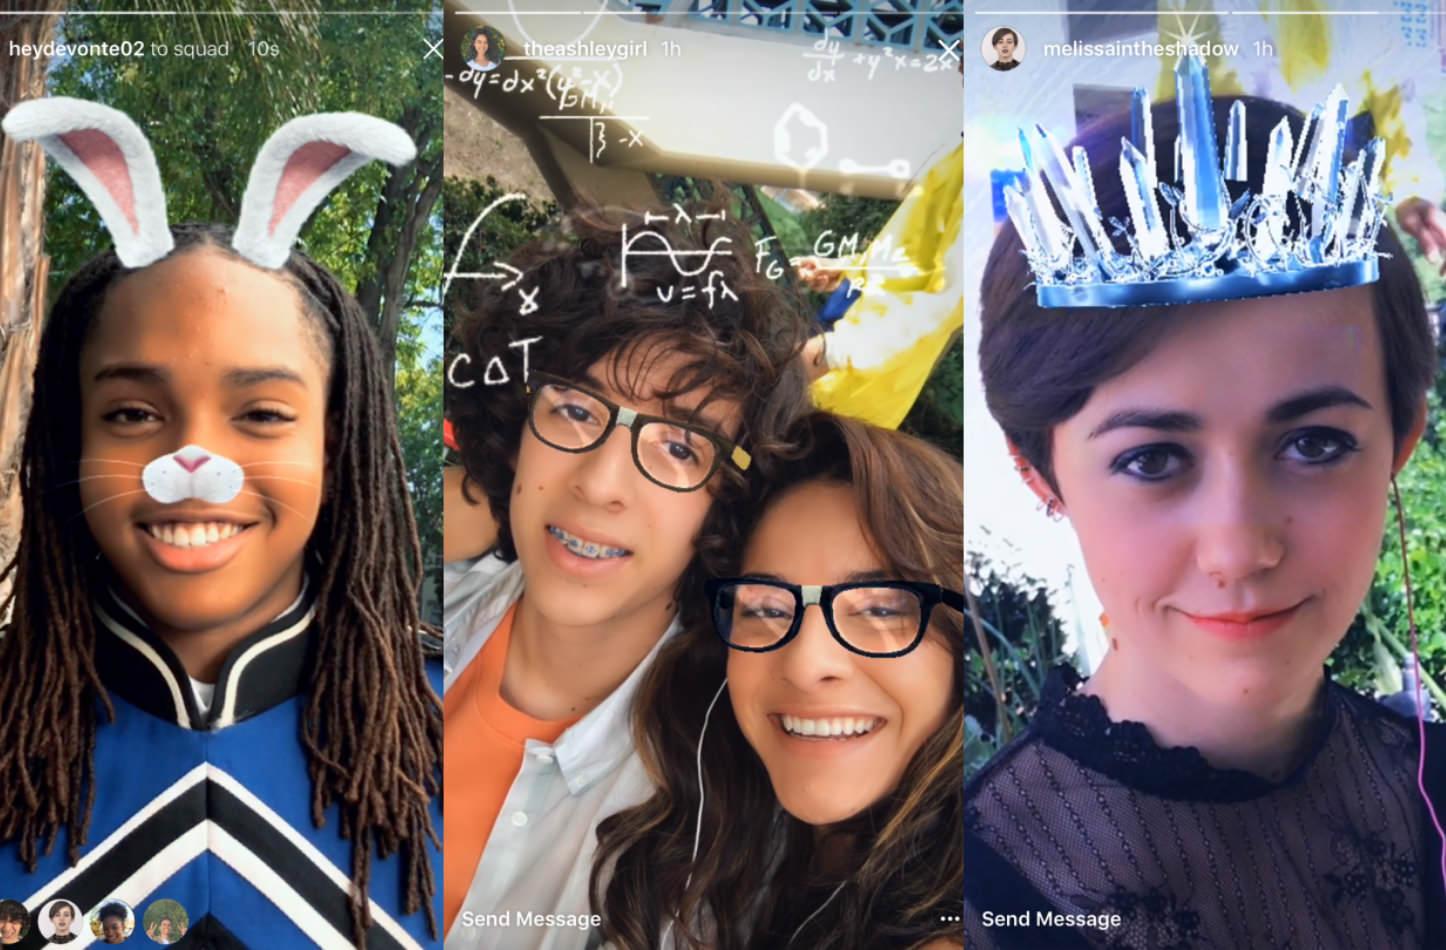 Instagram Copys Snapchat Again